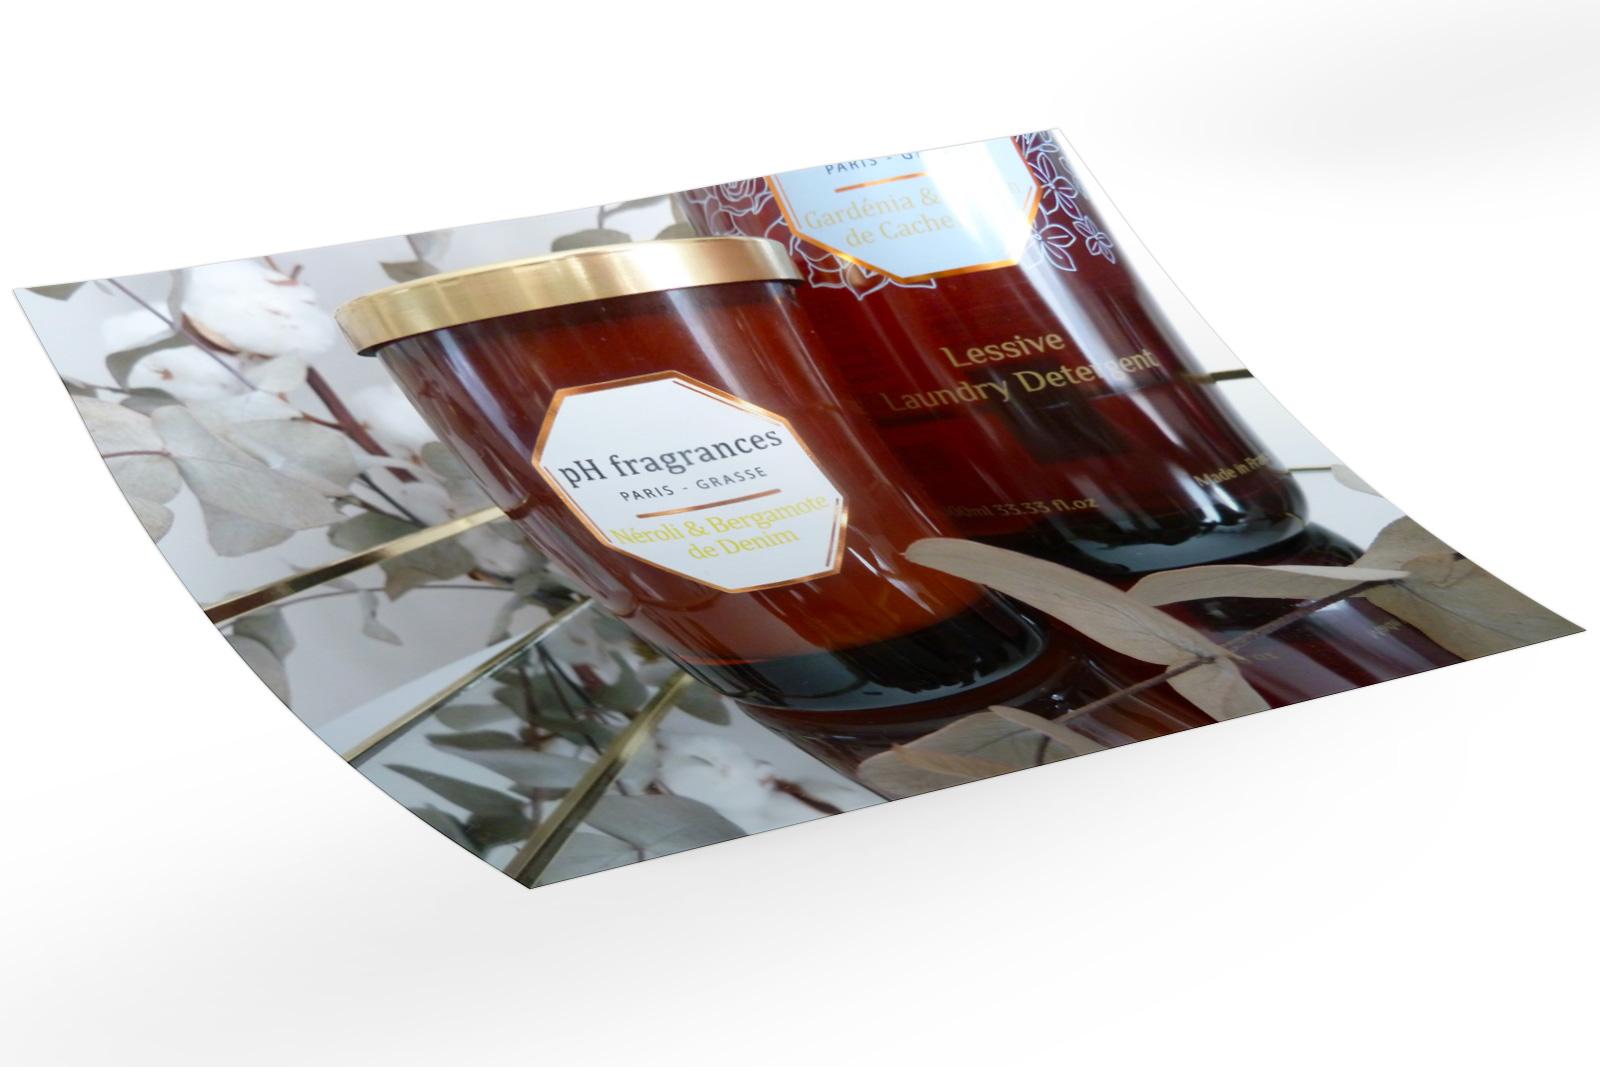 vitrine-ph-fragrances-jovoy-6